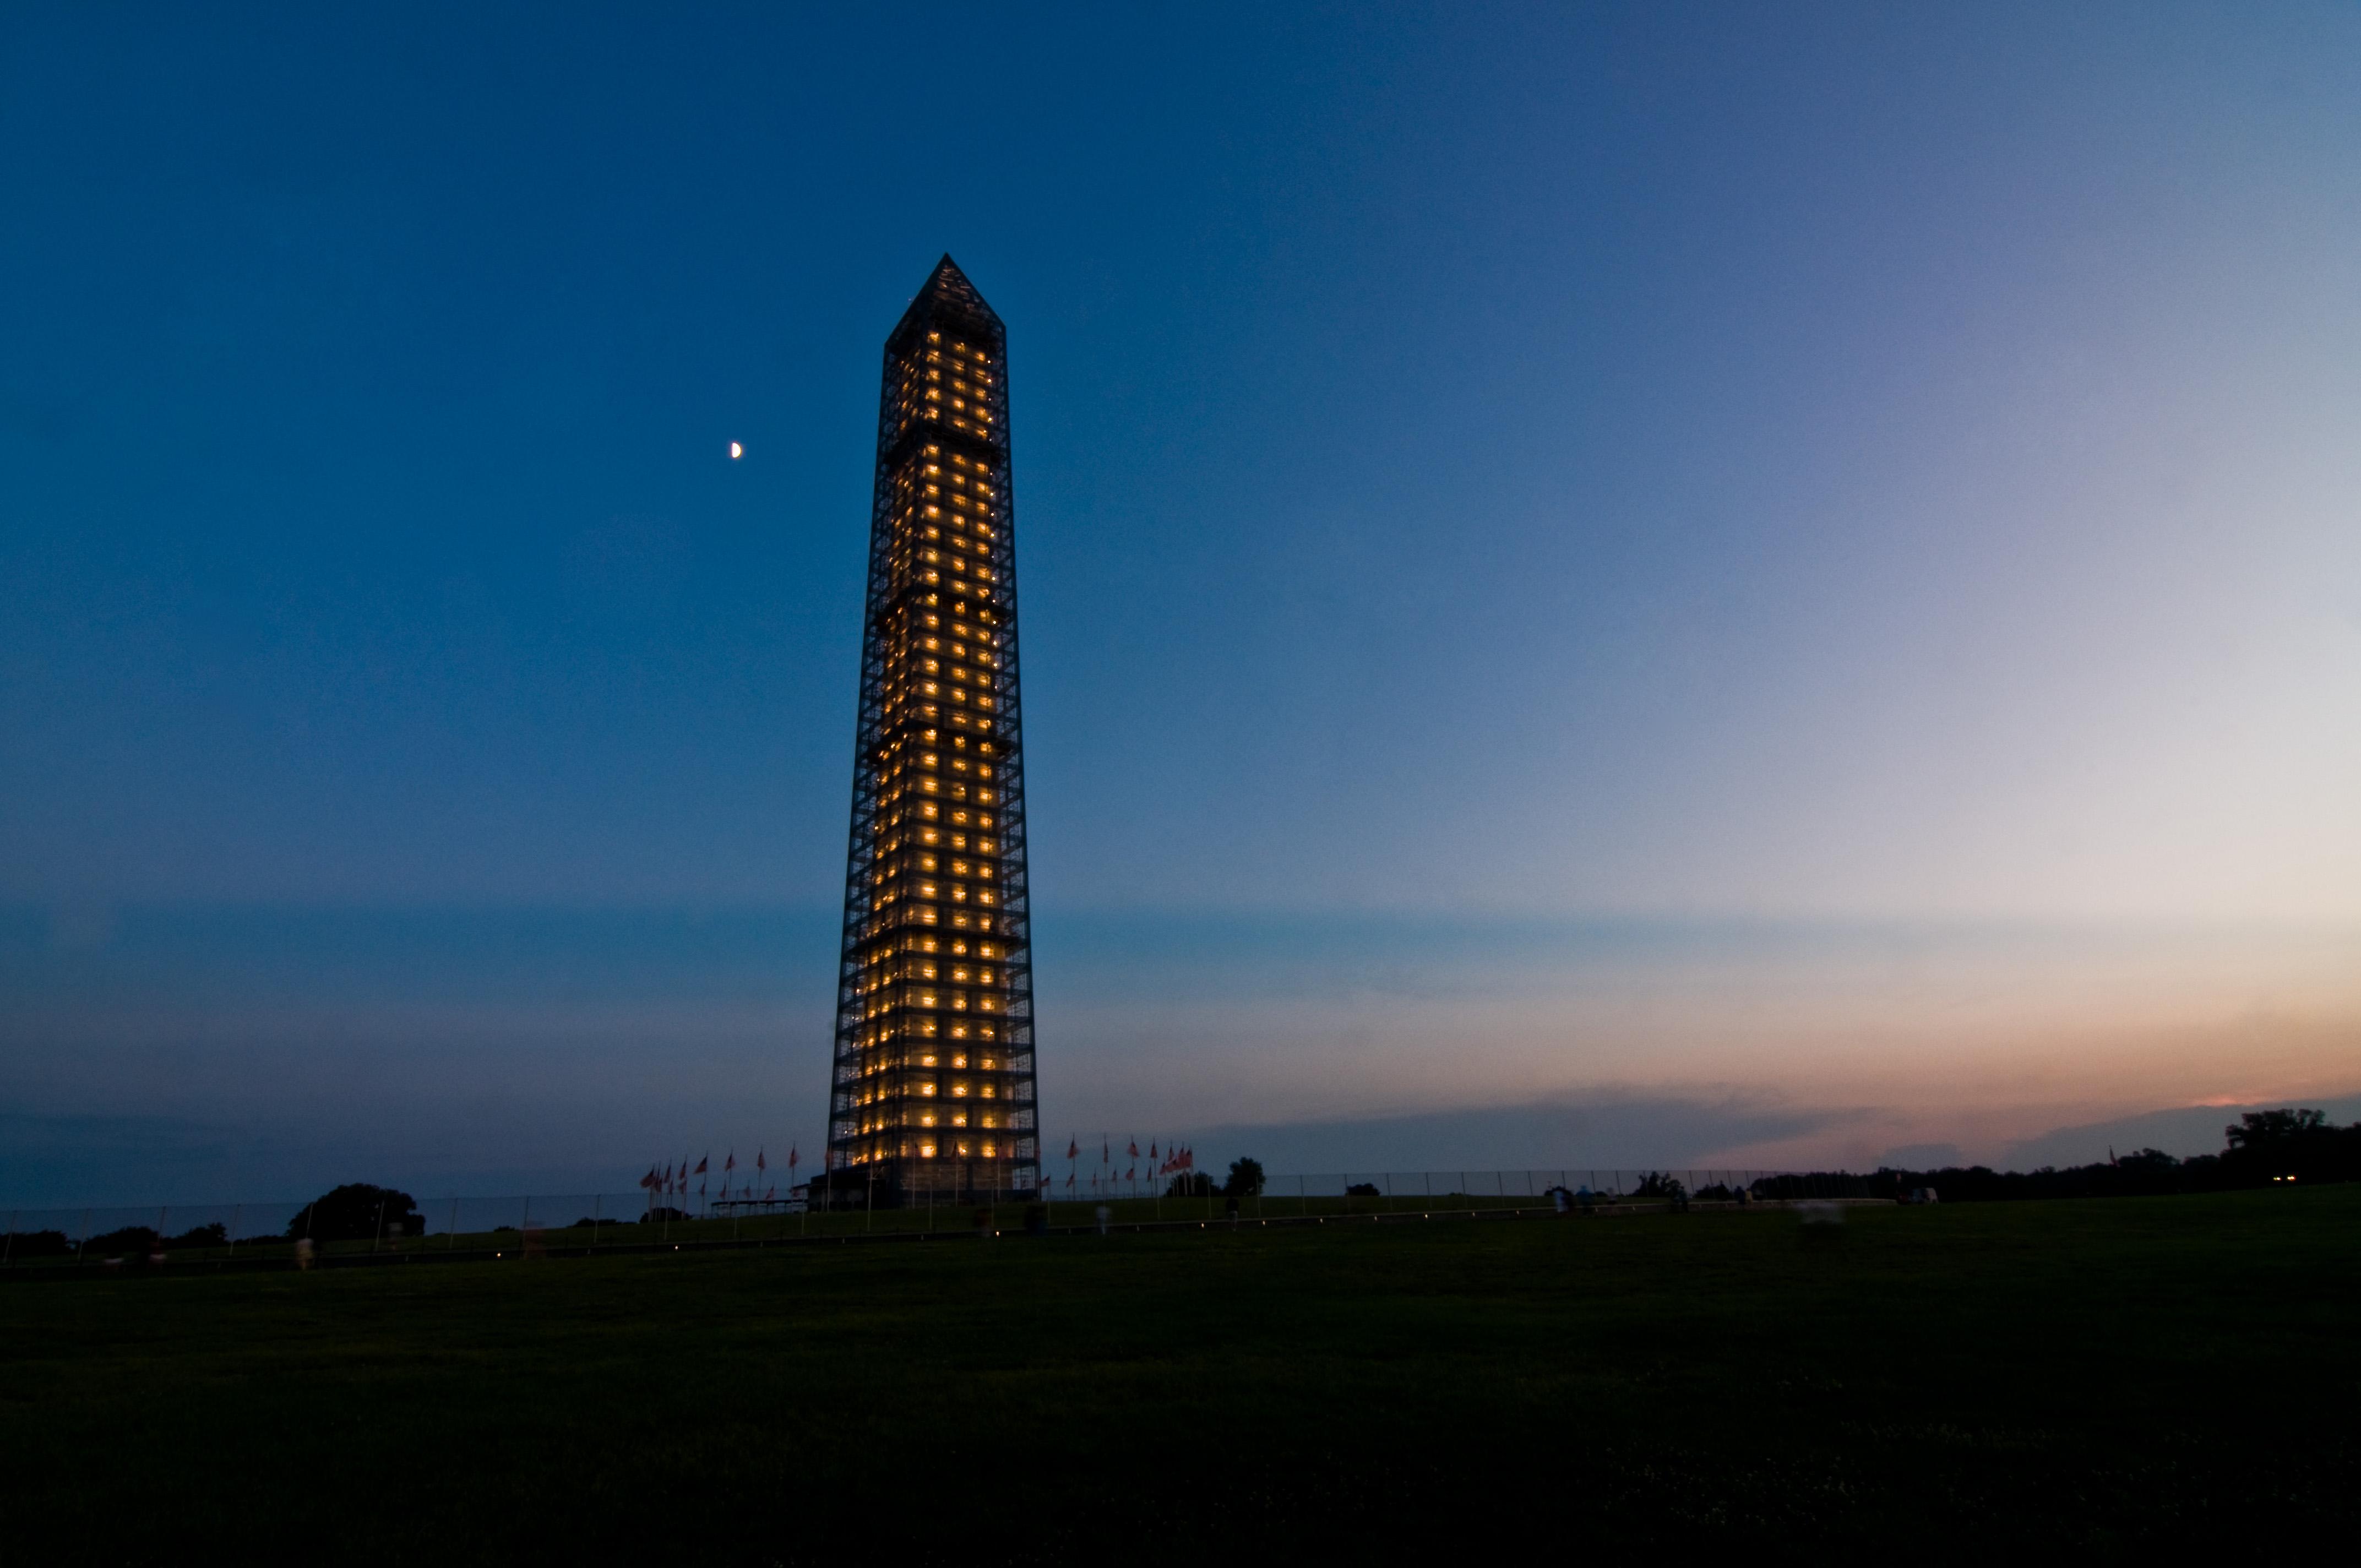 Washington Monument - In the Failing Light - 07-16-13